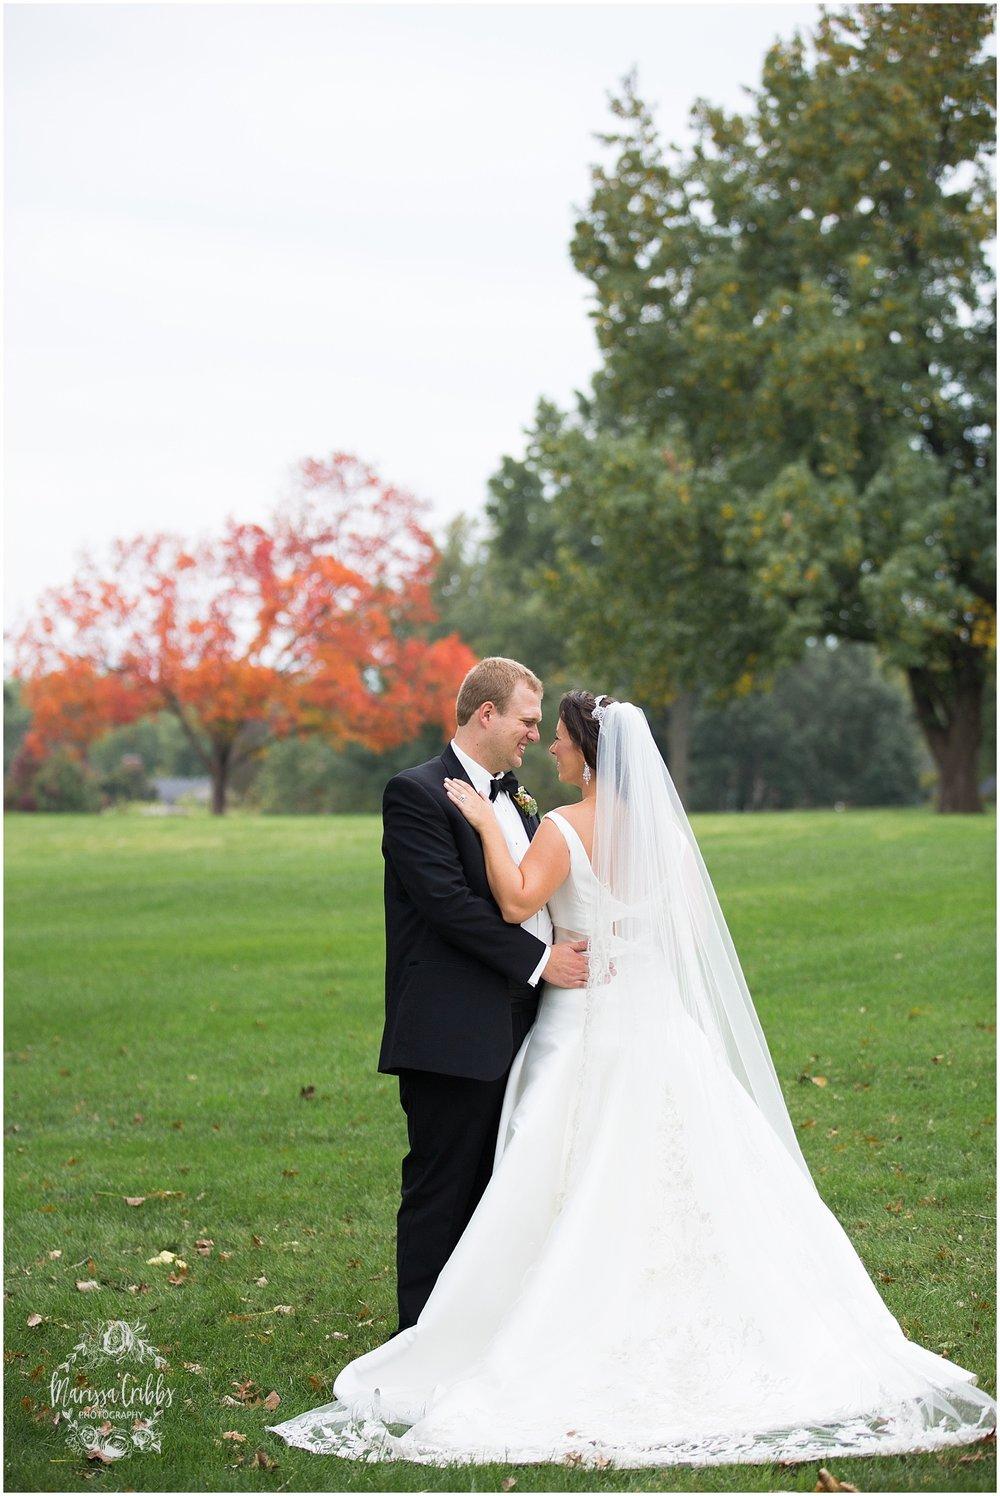 Blue Hills Country Club Wedding | Marissa Cribbs Photography | Nolte's Bridal | KC Wedding Photographer | KC Weddings_1168.jpg